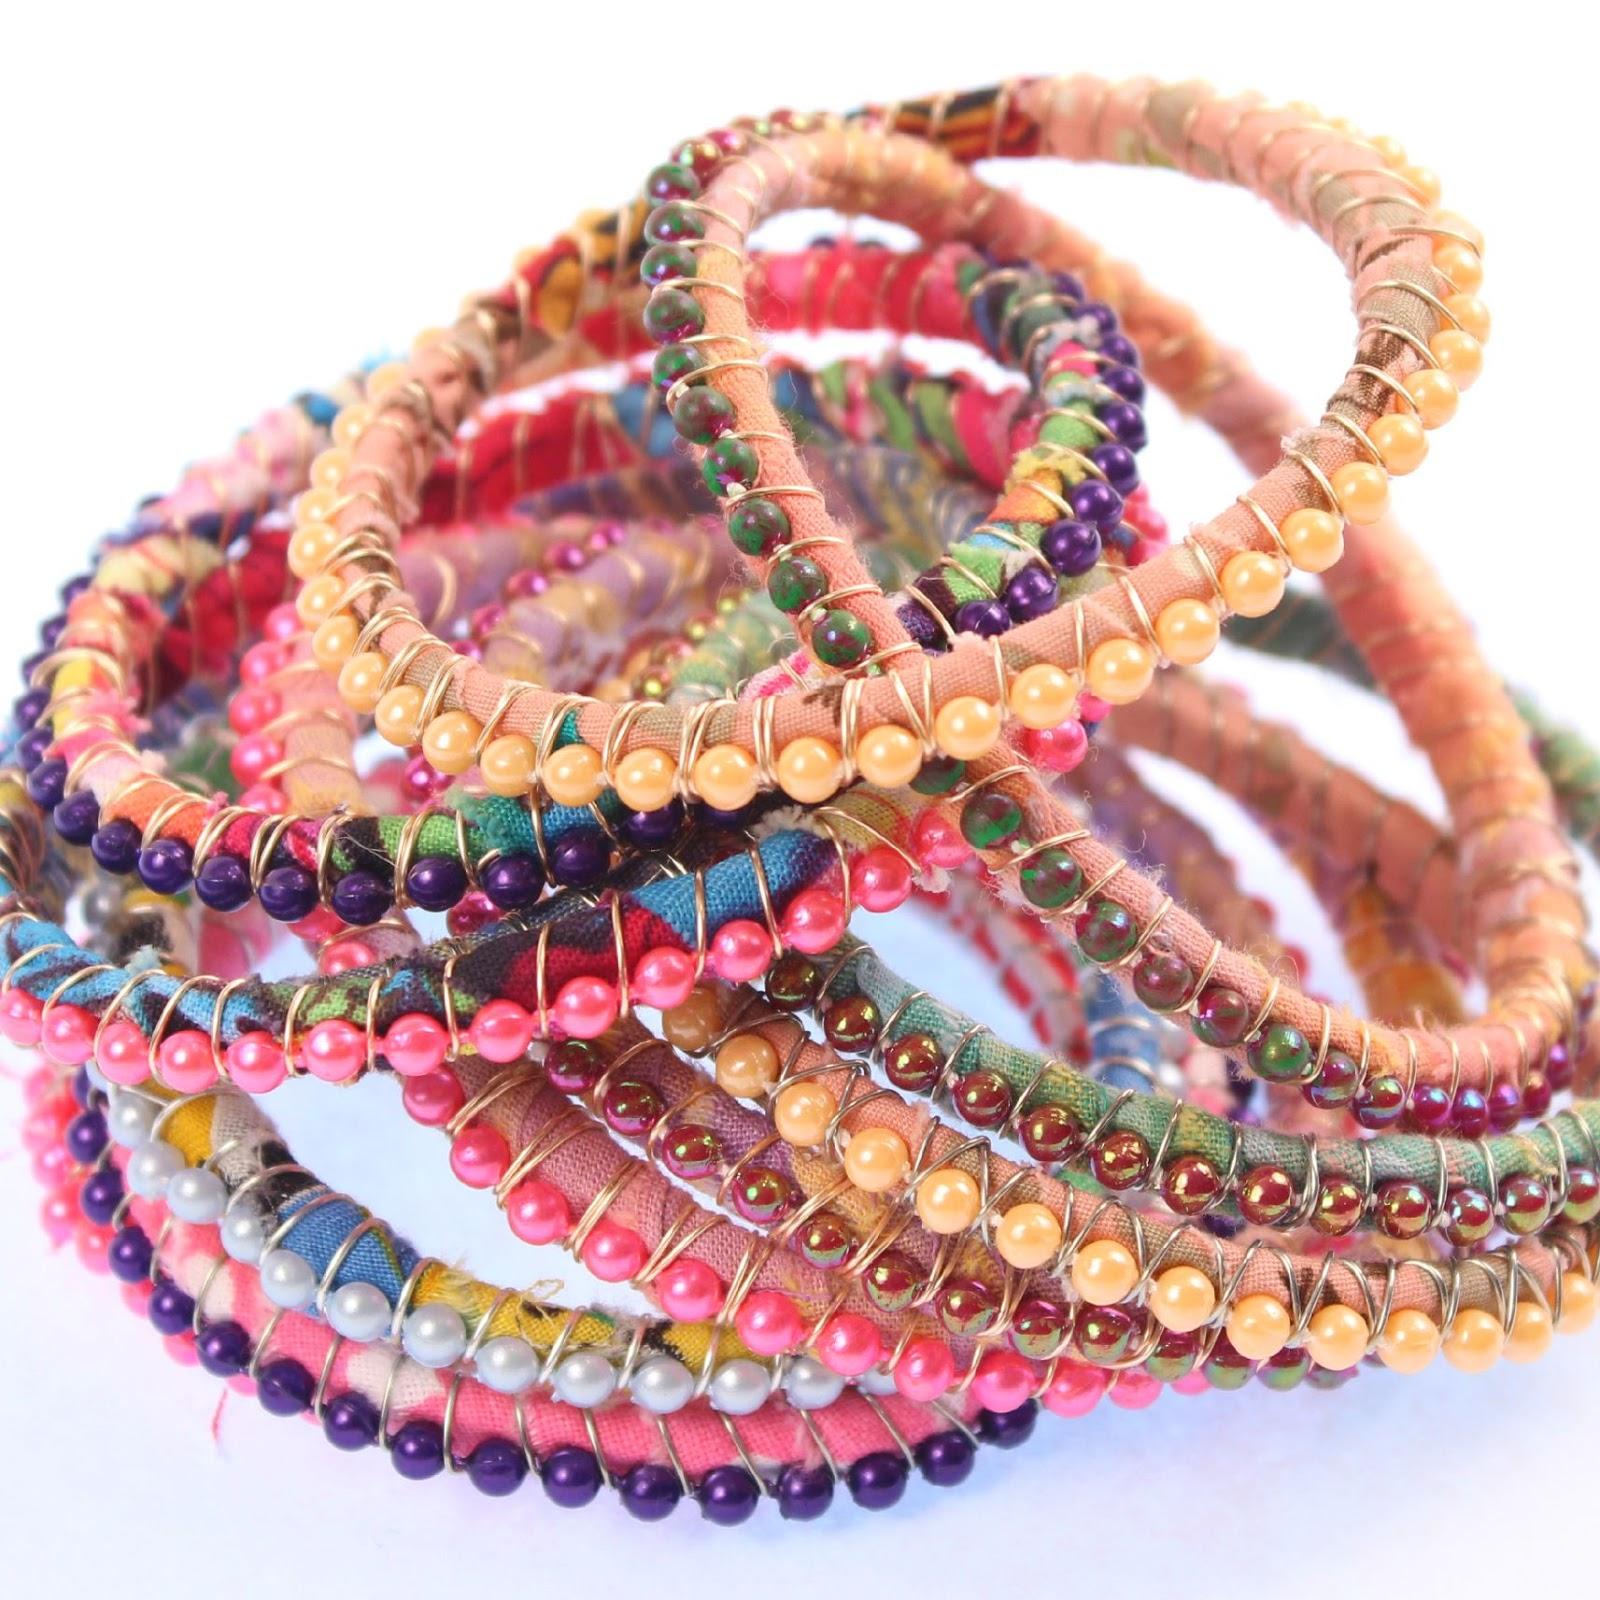 Mark montano new boho bracelets diy new boho bracelets diy solutioingenieria Choice Image